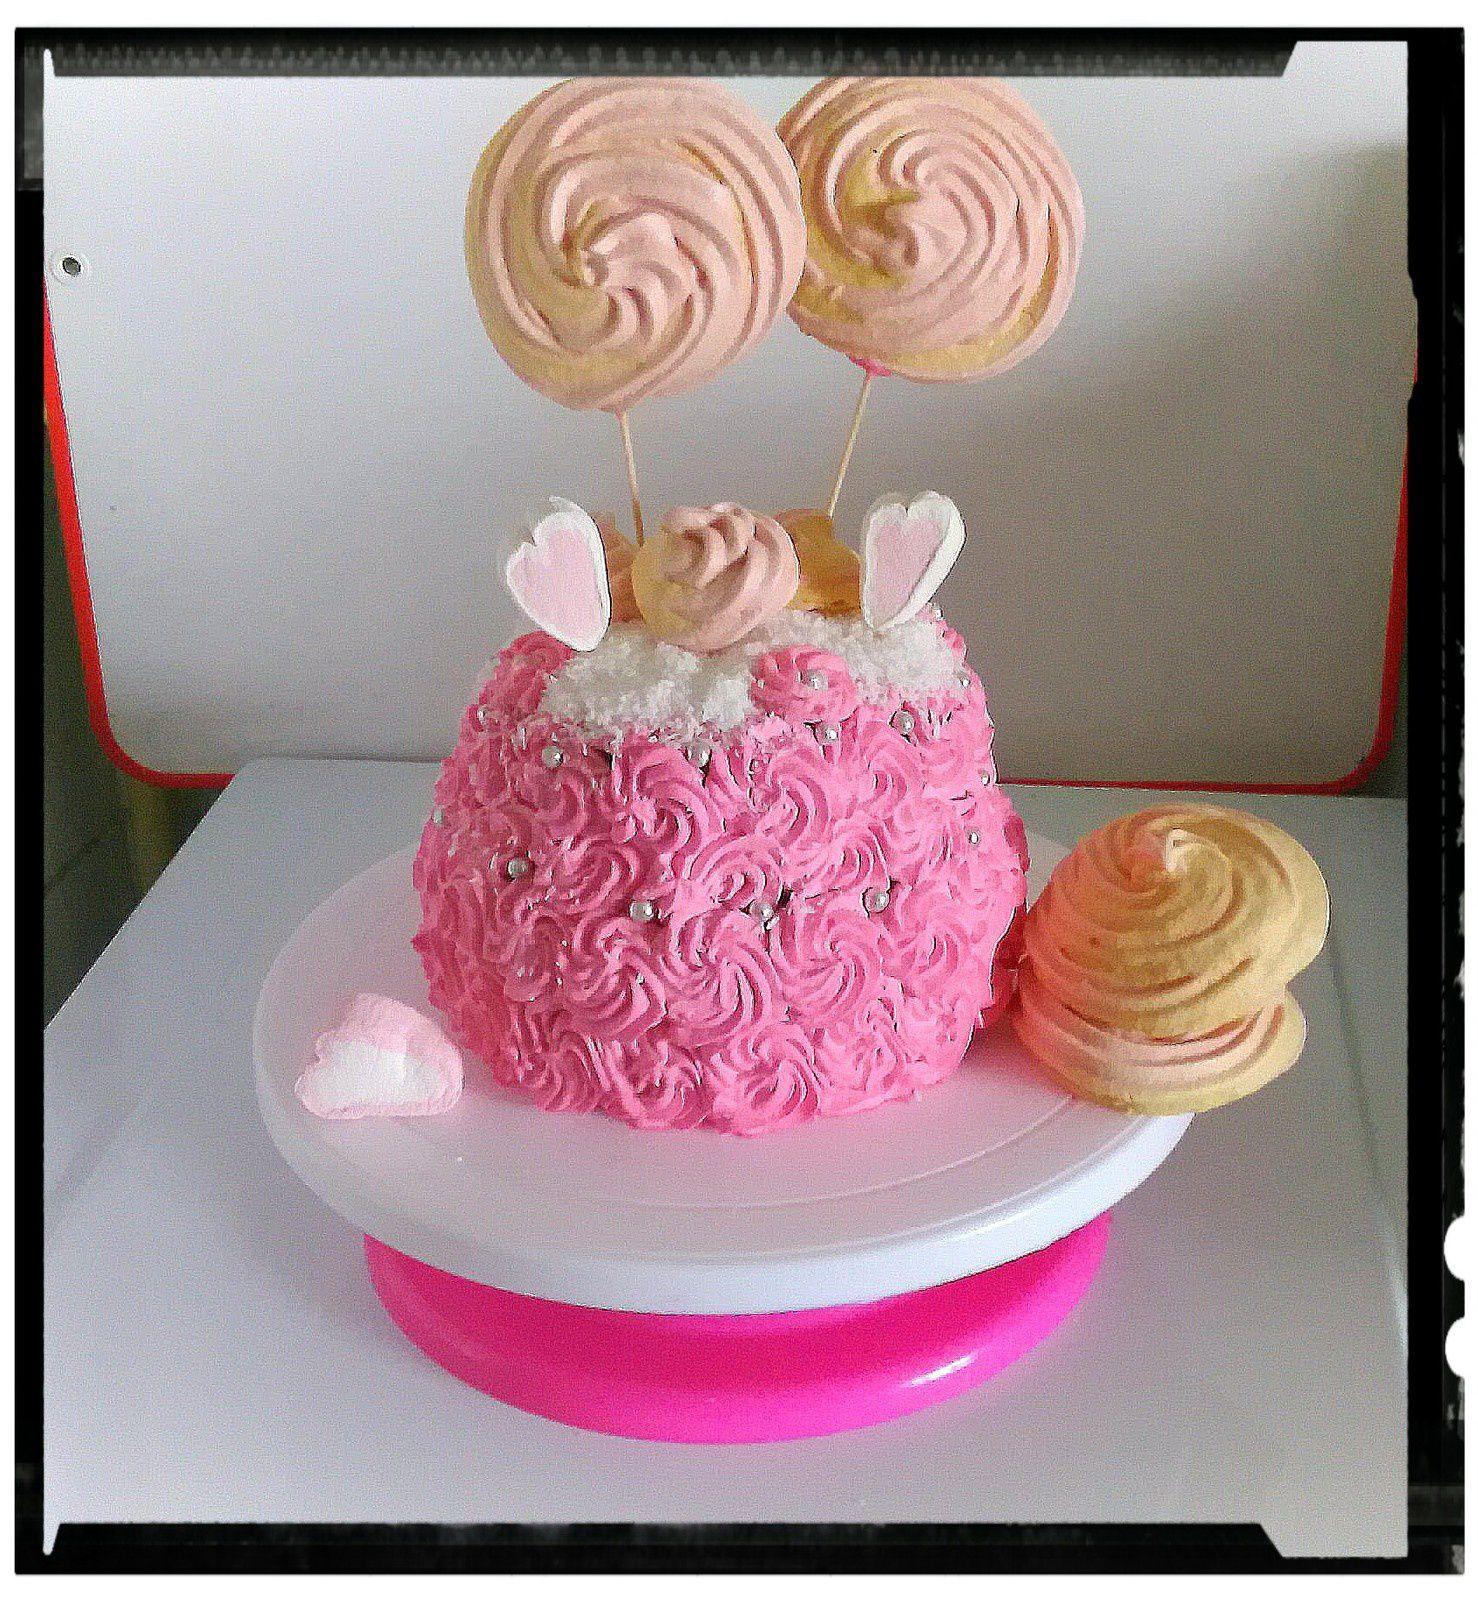 girly cake choco-fraise noix de coco